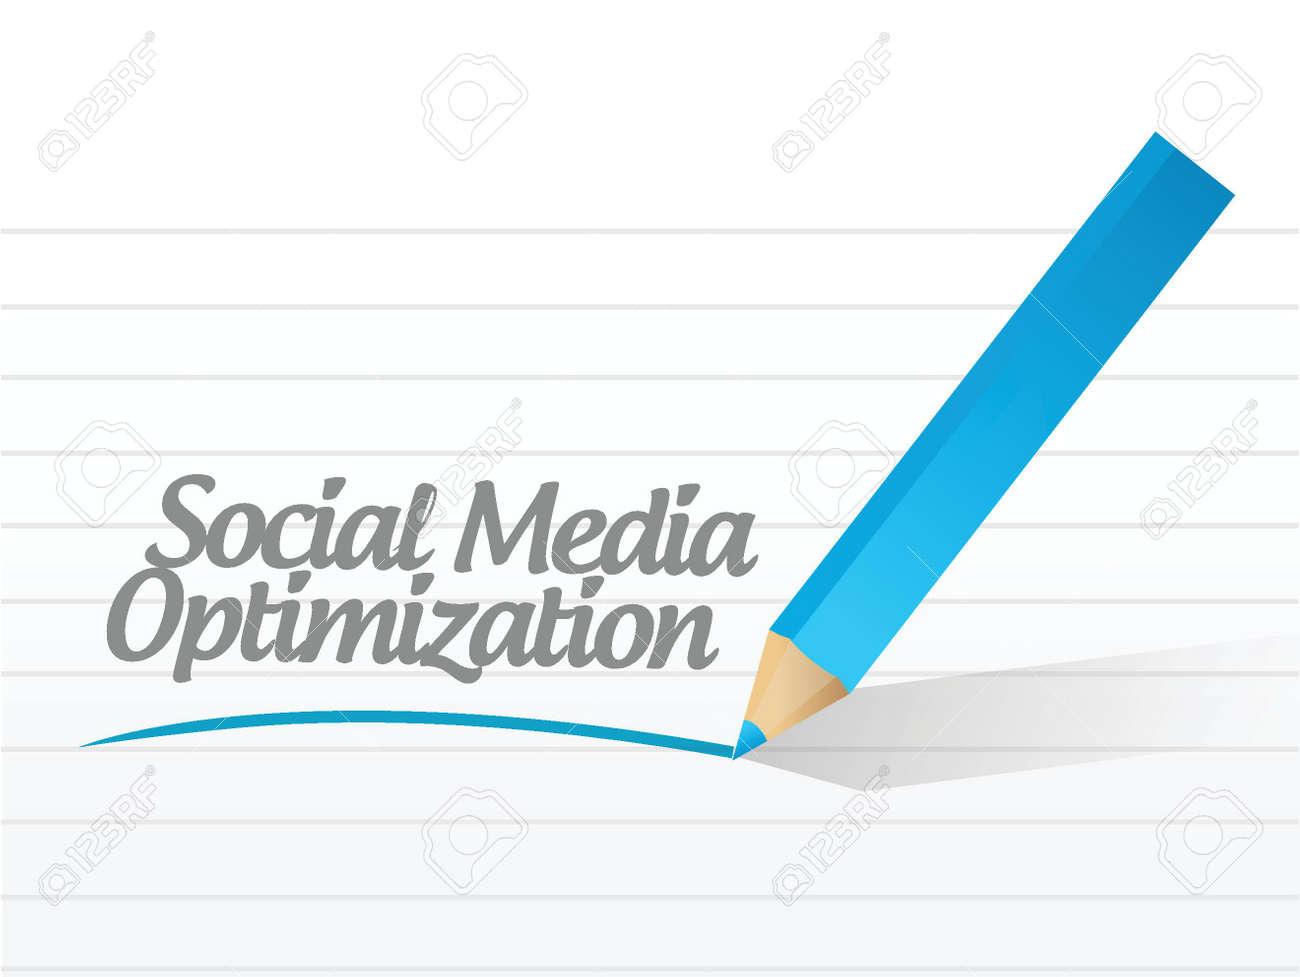 social media optimization message illustration design over a white background Stock Vector - 24654927